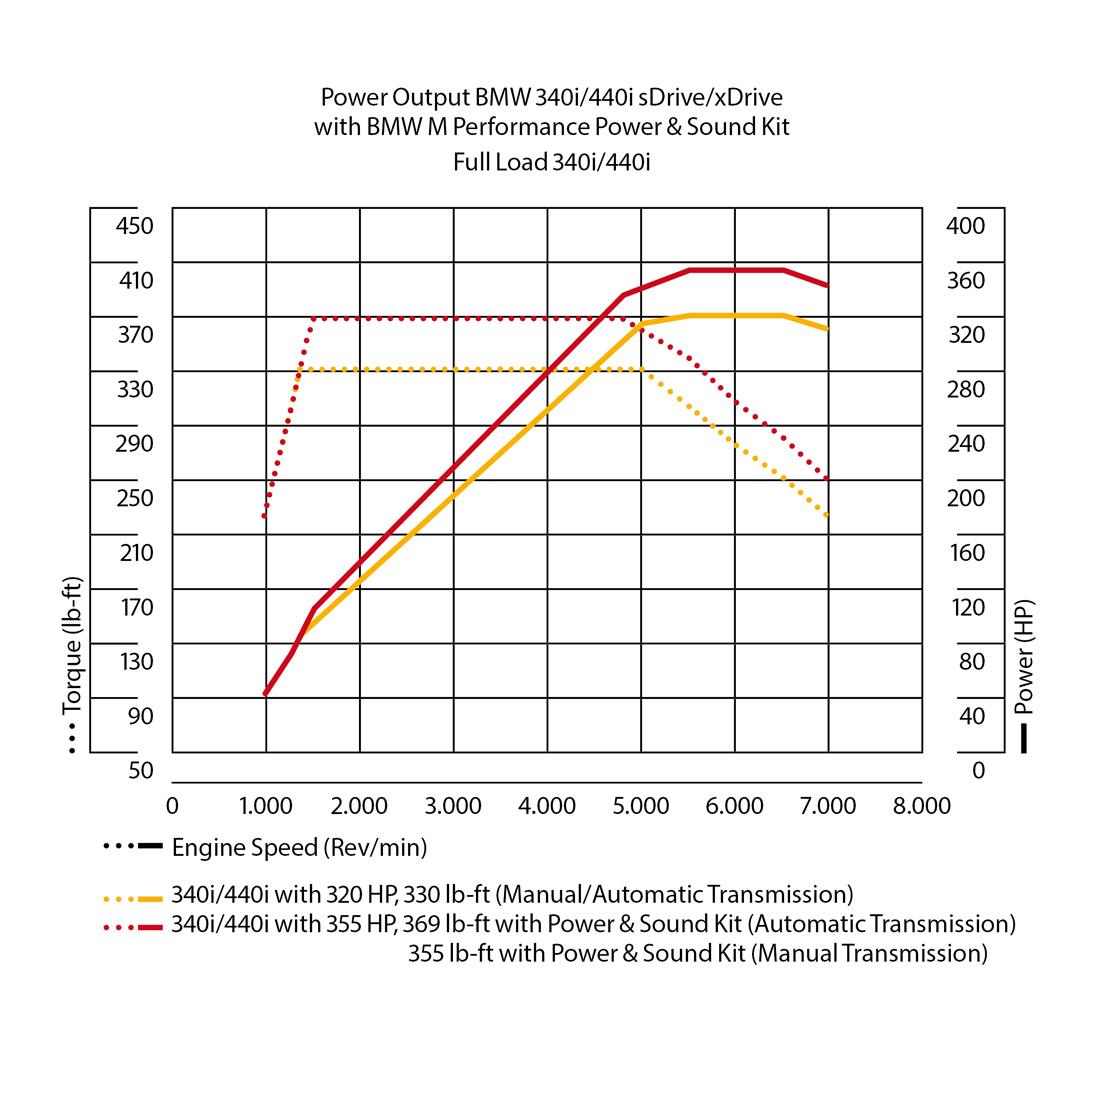 BMW M Performance Power and Sound Kit